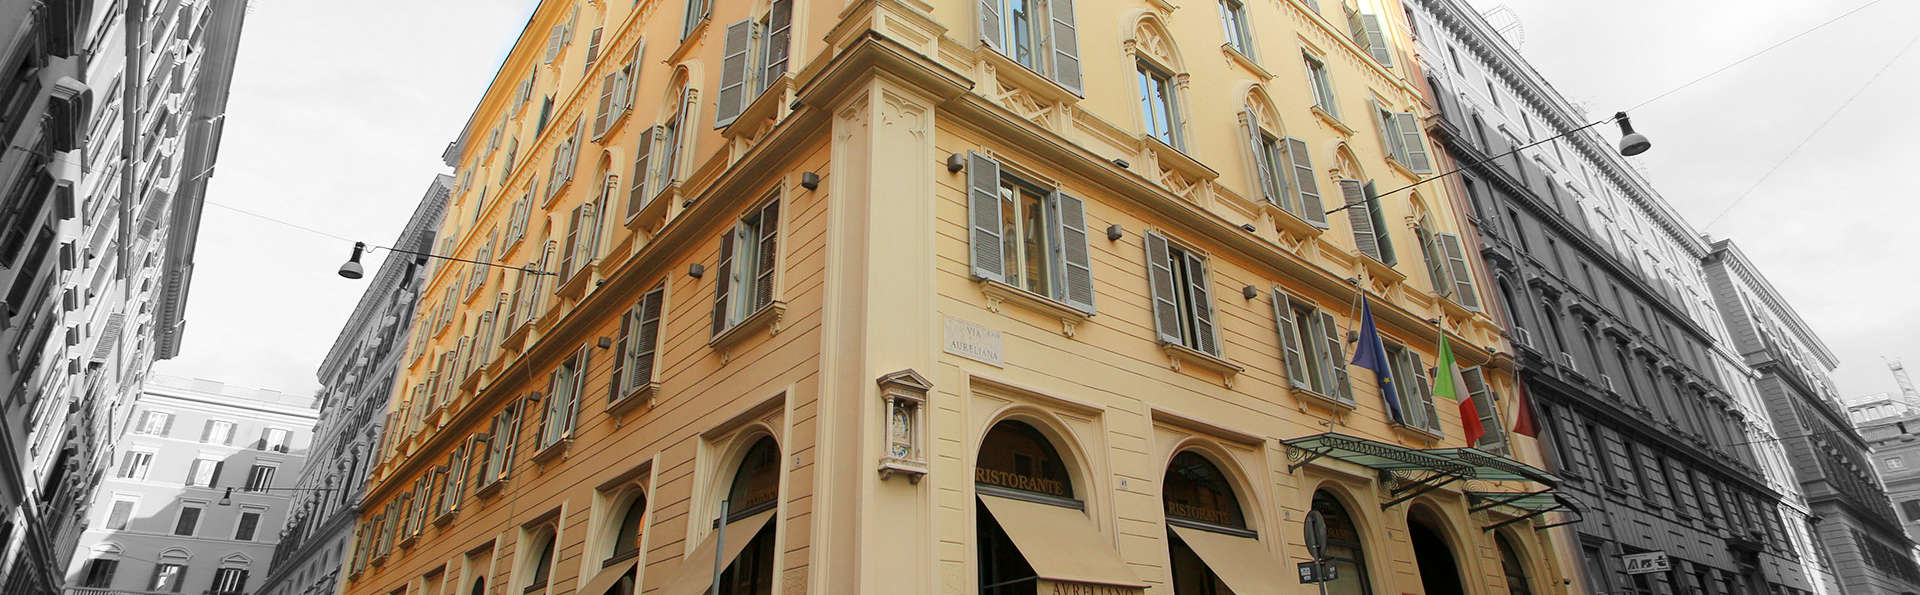 empire palace hotel 4 rome italie. Black Bedroom Furniture Sets. Home Design Ideas